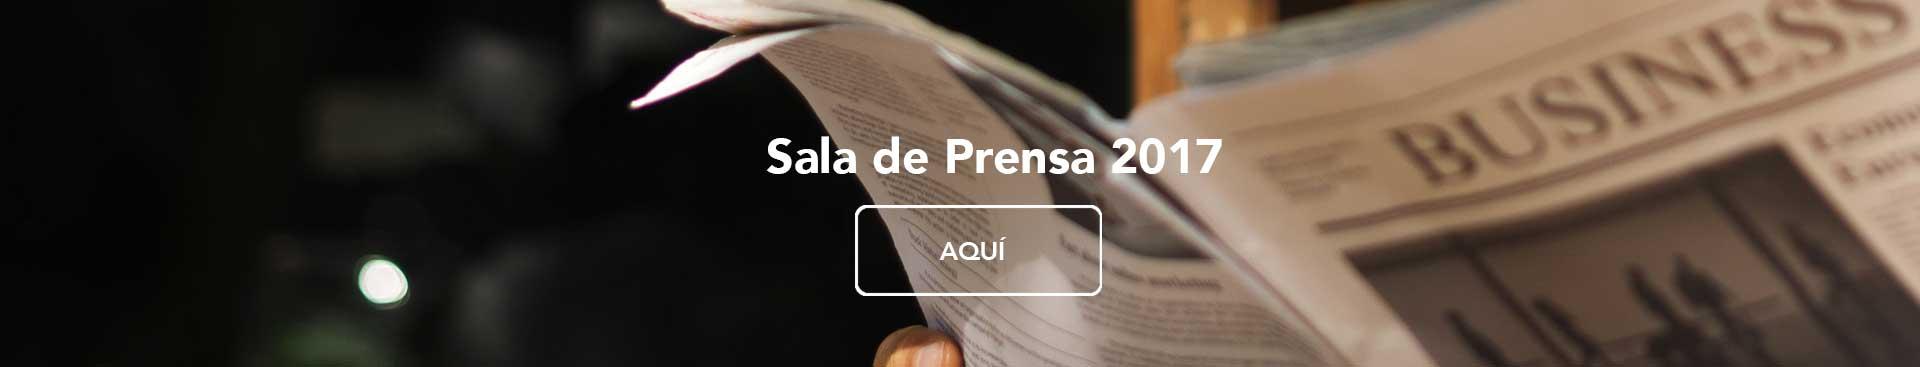 Sala de Prensa Agremia 2017